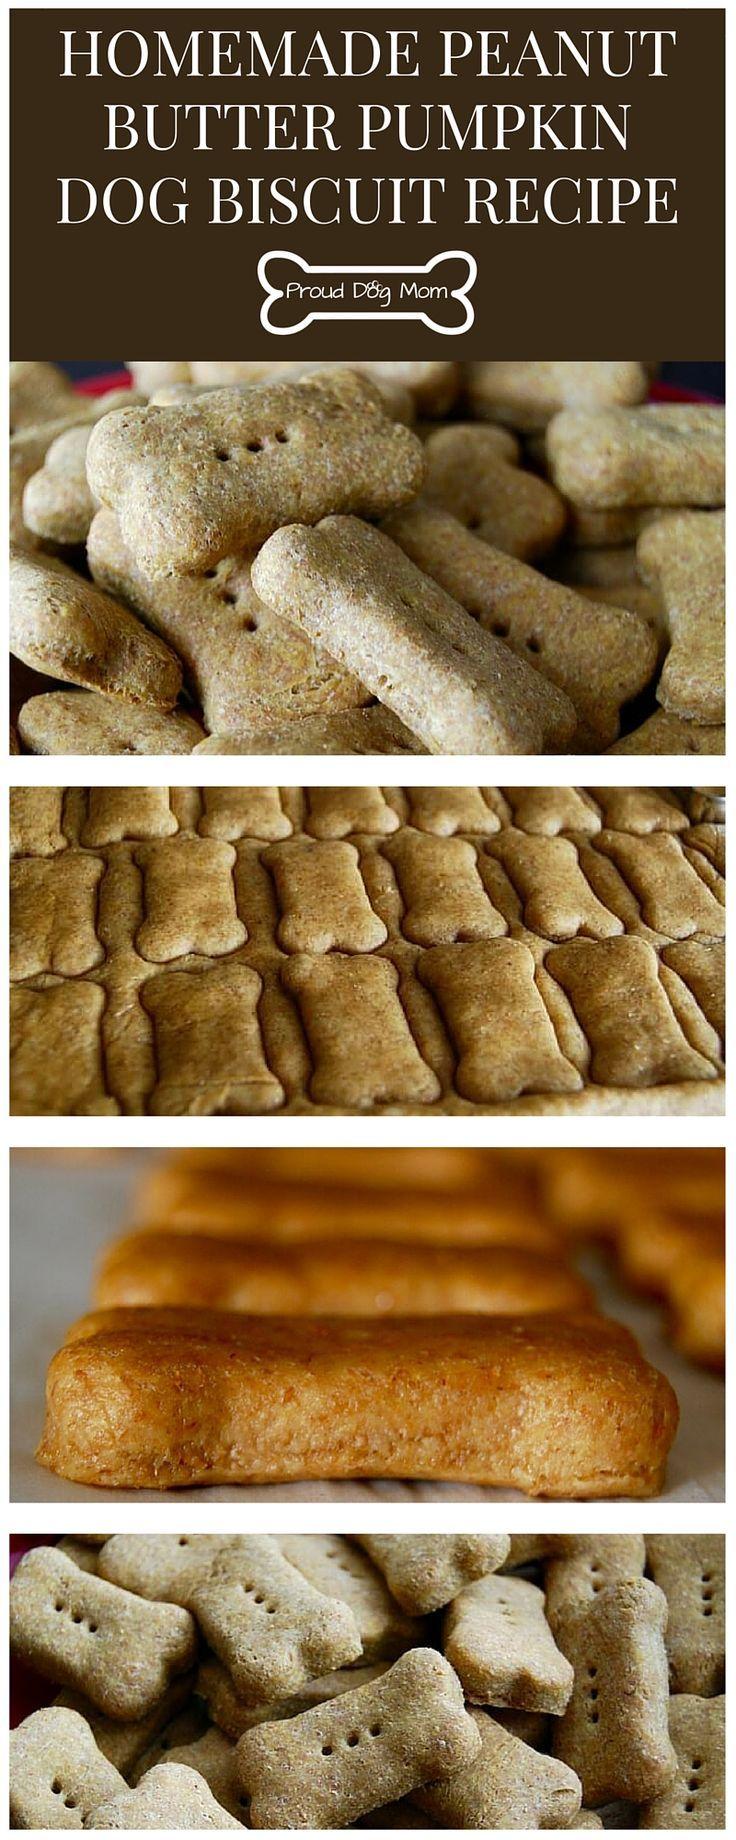 Homemade Peanut Butter Pumpkin Dog Biscuit Recipe | DIY Dog Treats.                                                                                                                                                                                 More